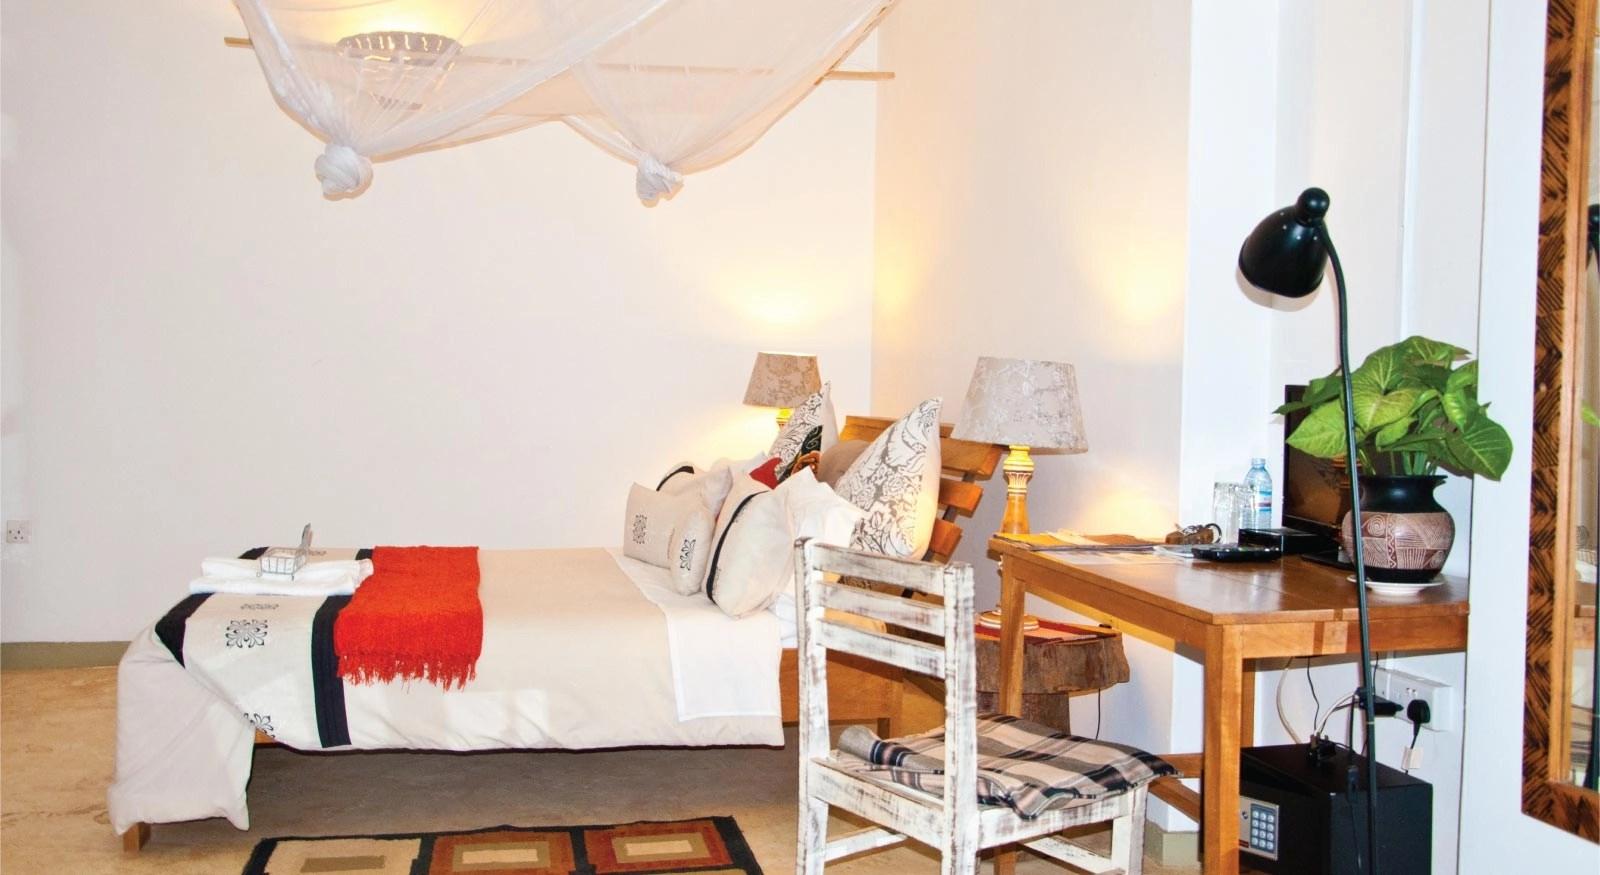 Gately Inn Entebbe Accommodation Lodge -